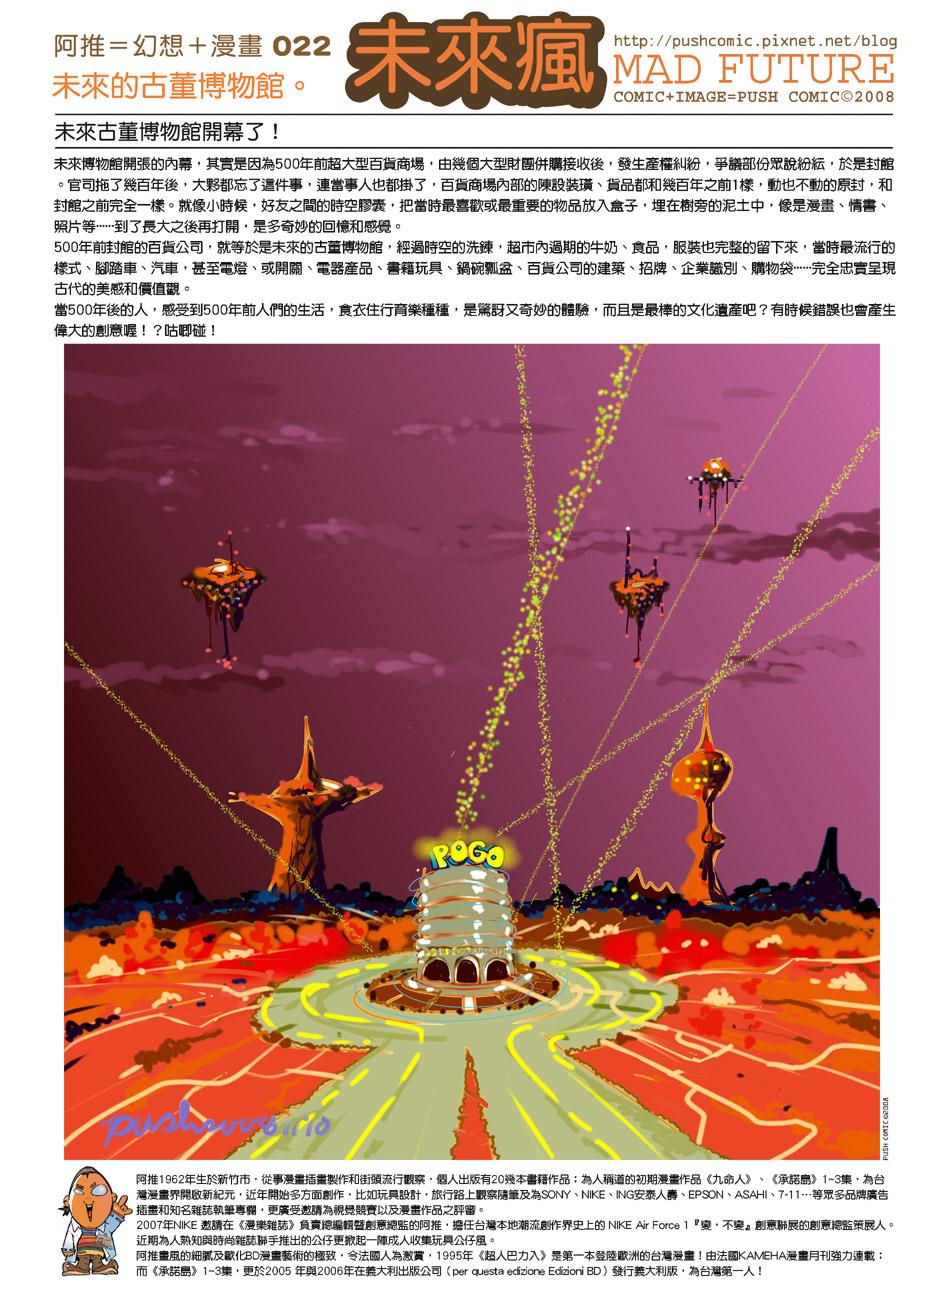 Ming-022-MF-byPUSH-S.jpg